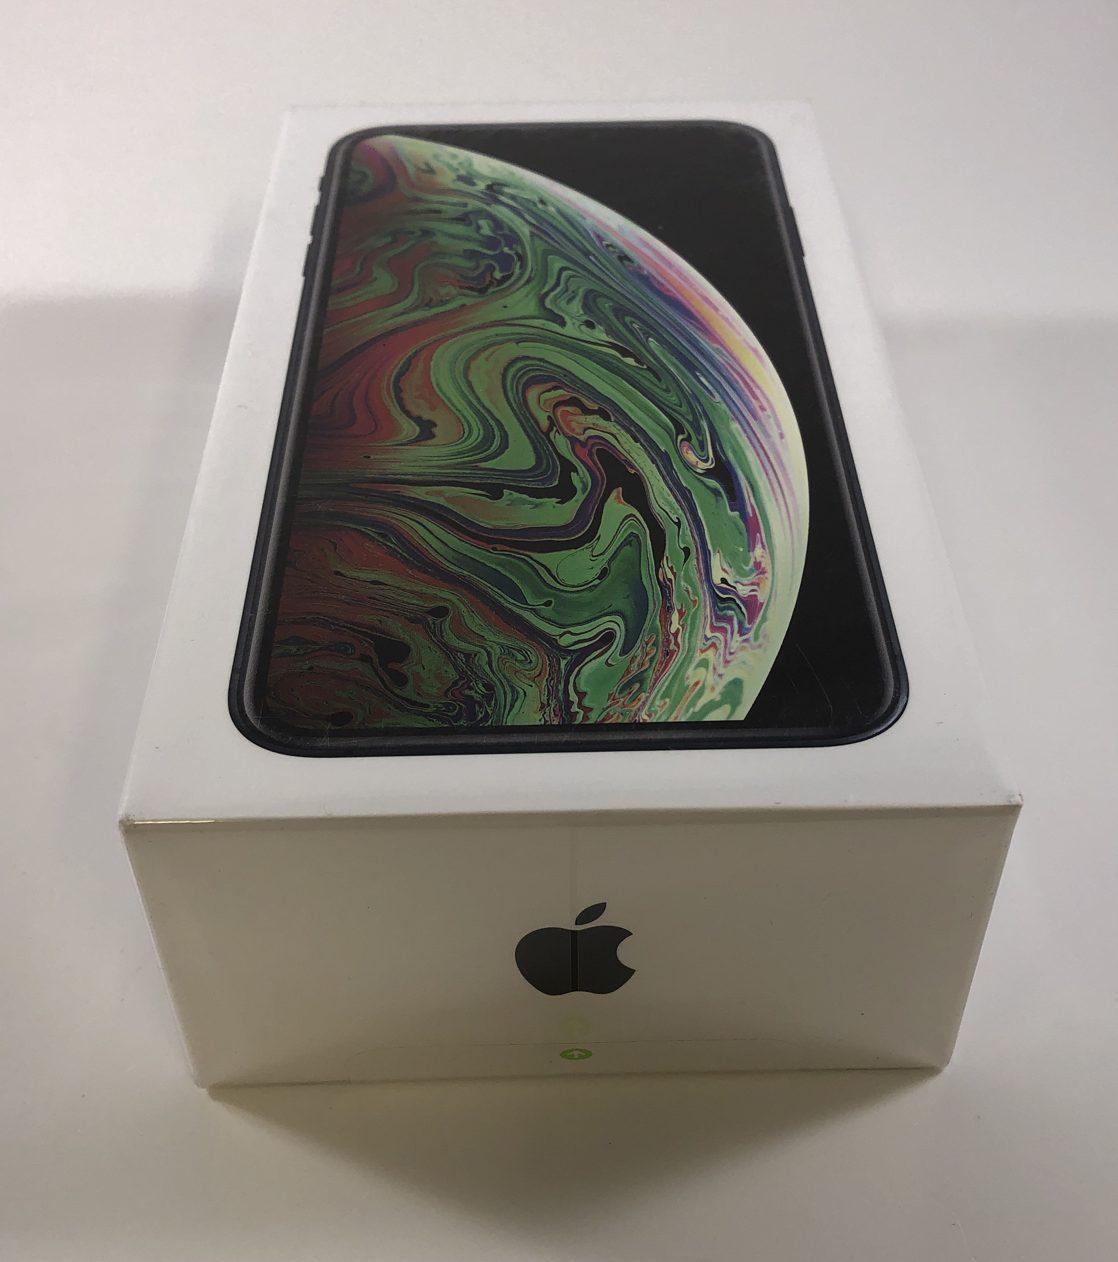 iPhone XS Max 512GB, 512GB, Space Gray, image 1